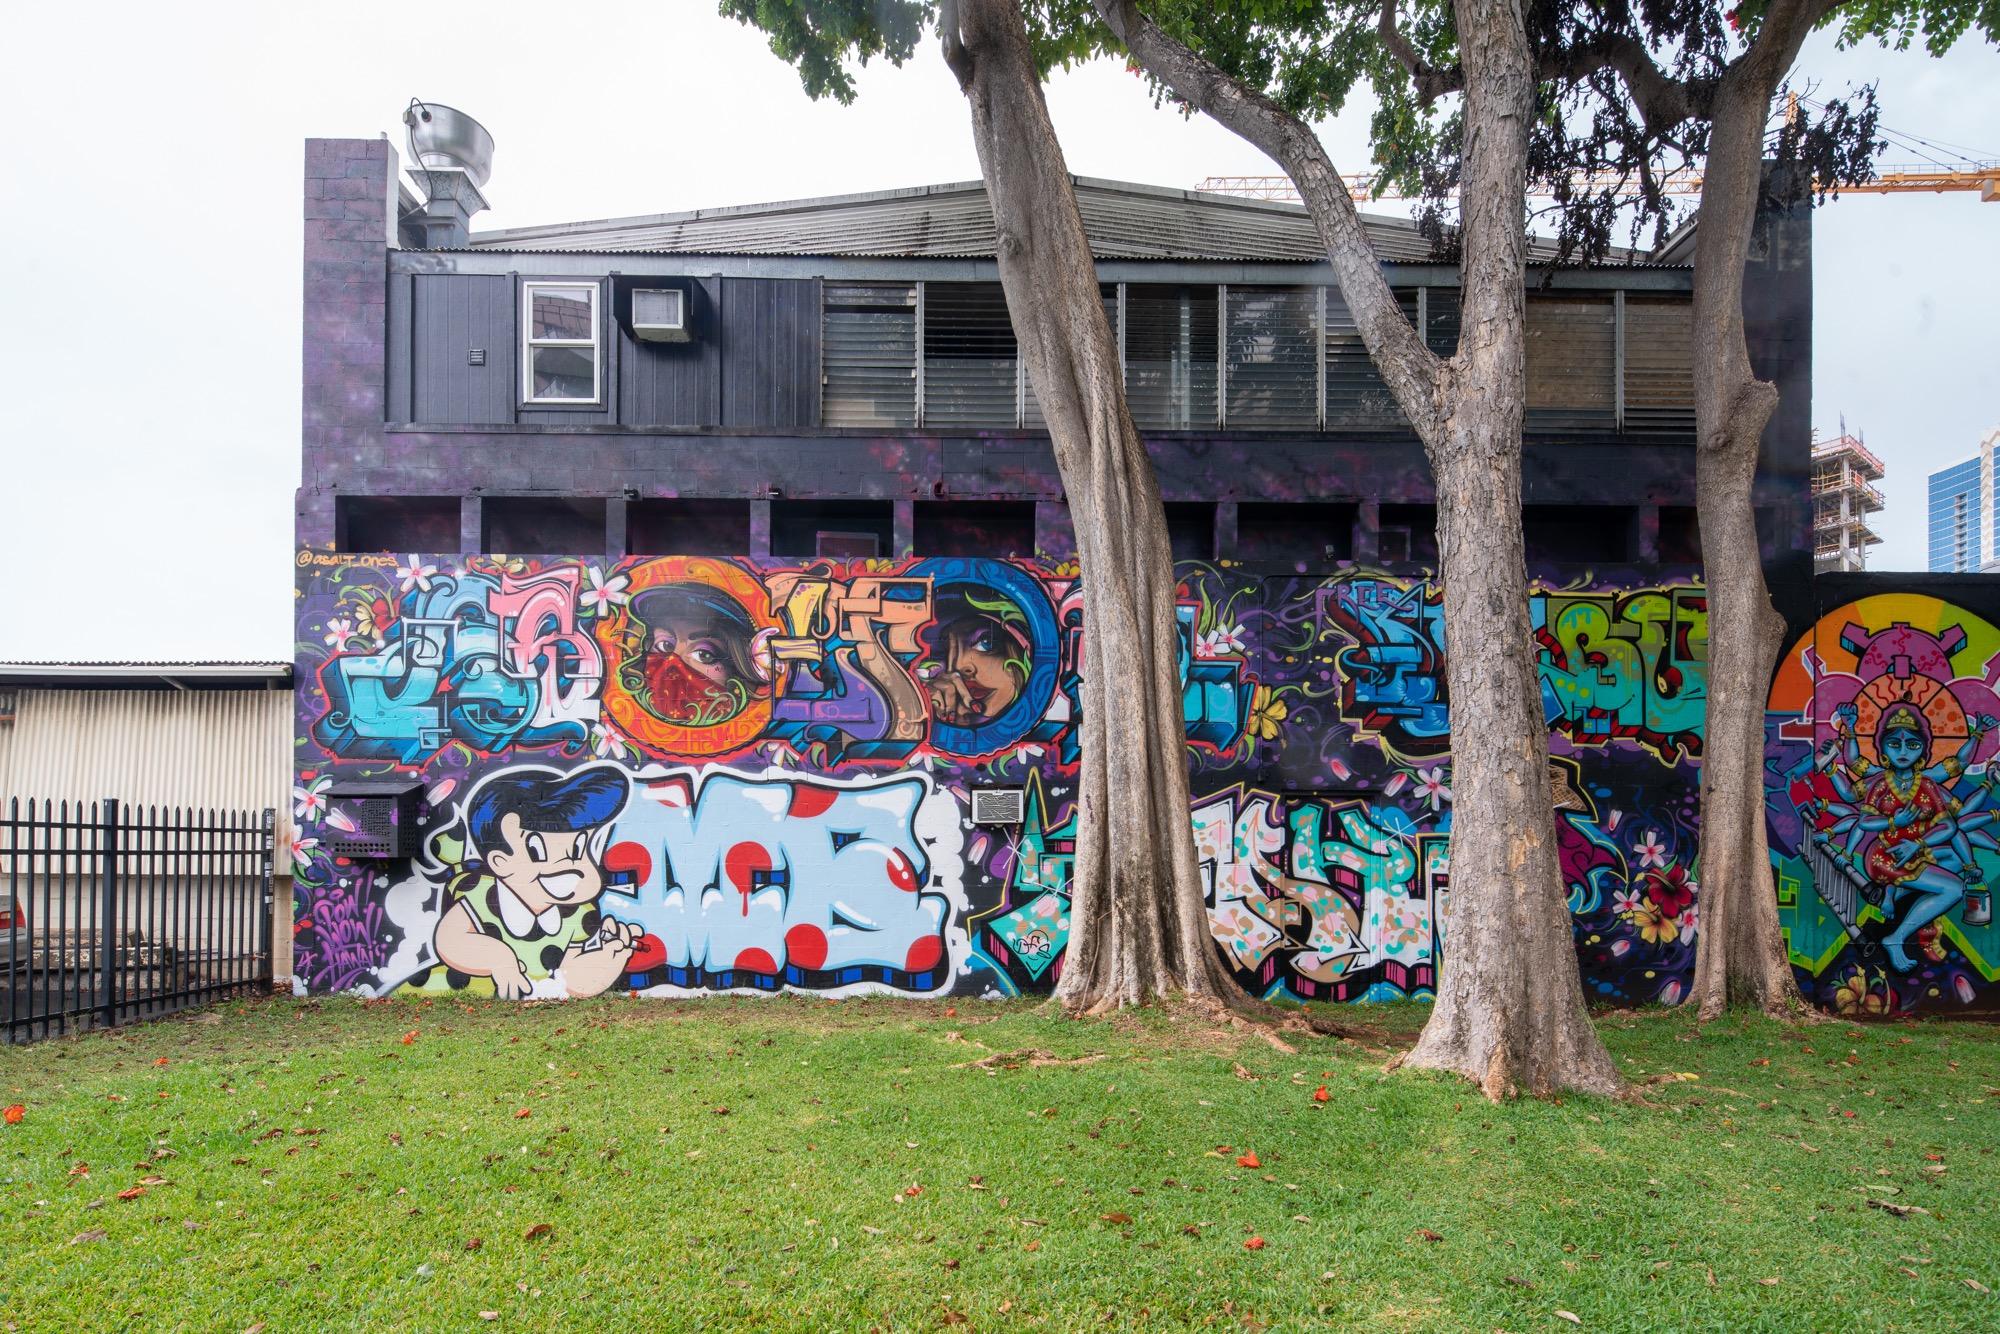 Recap: POW! WOW! Hawaii 2019 Artes & contextos pwh2019 UKCrew 02 mrjasperwong